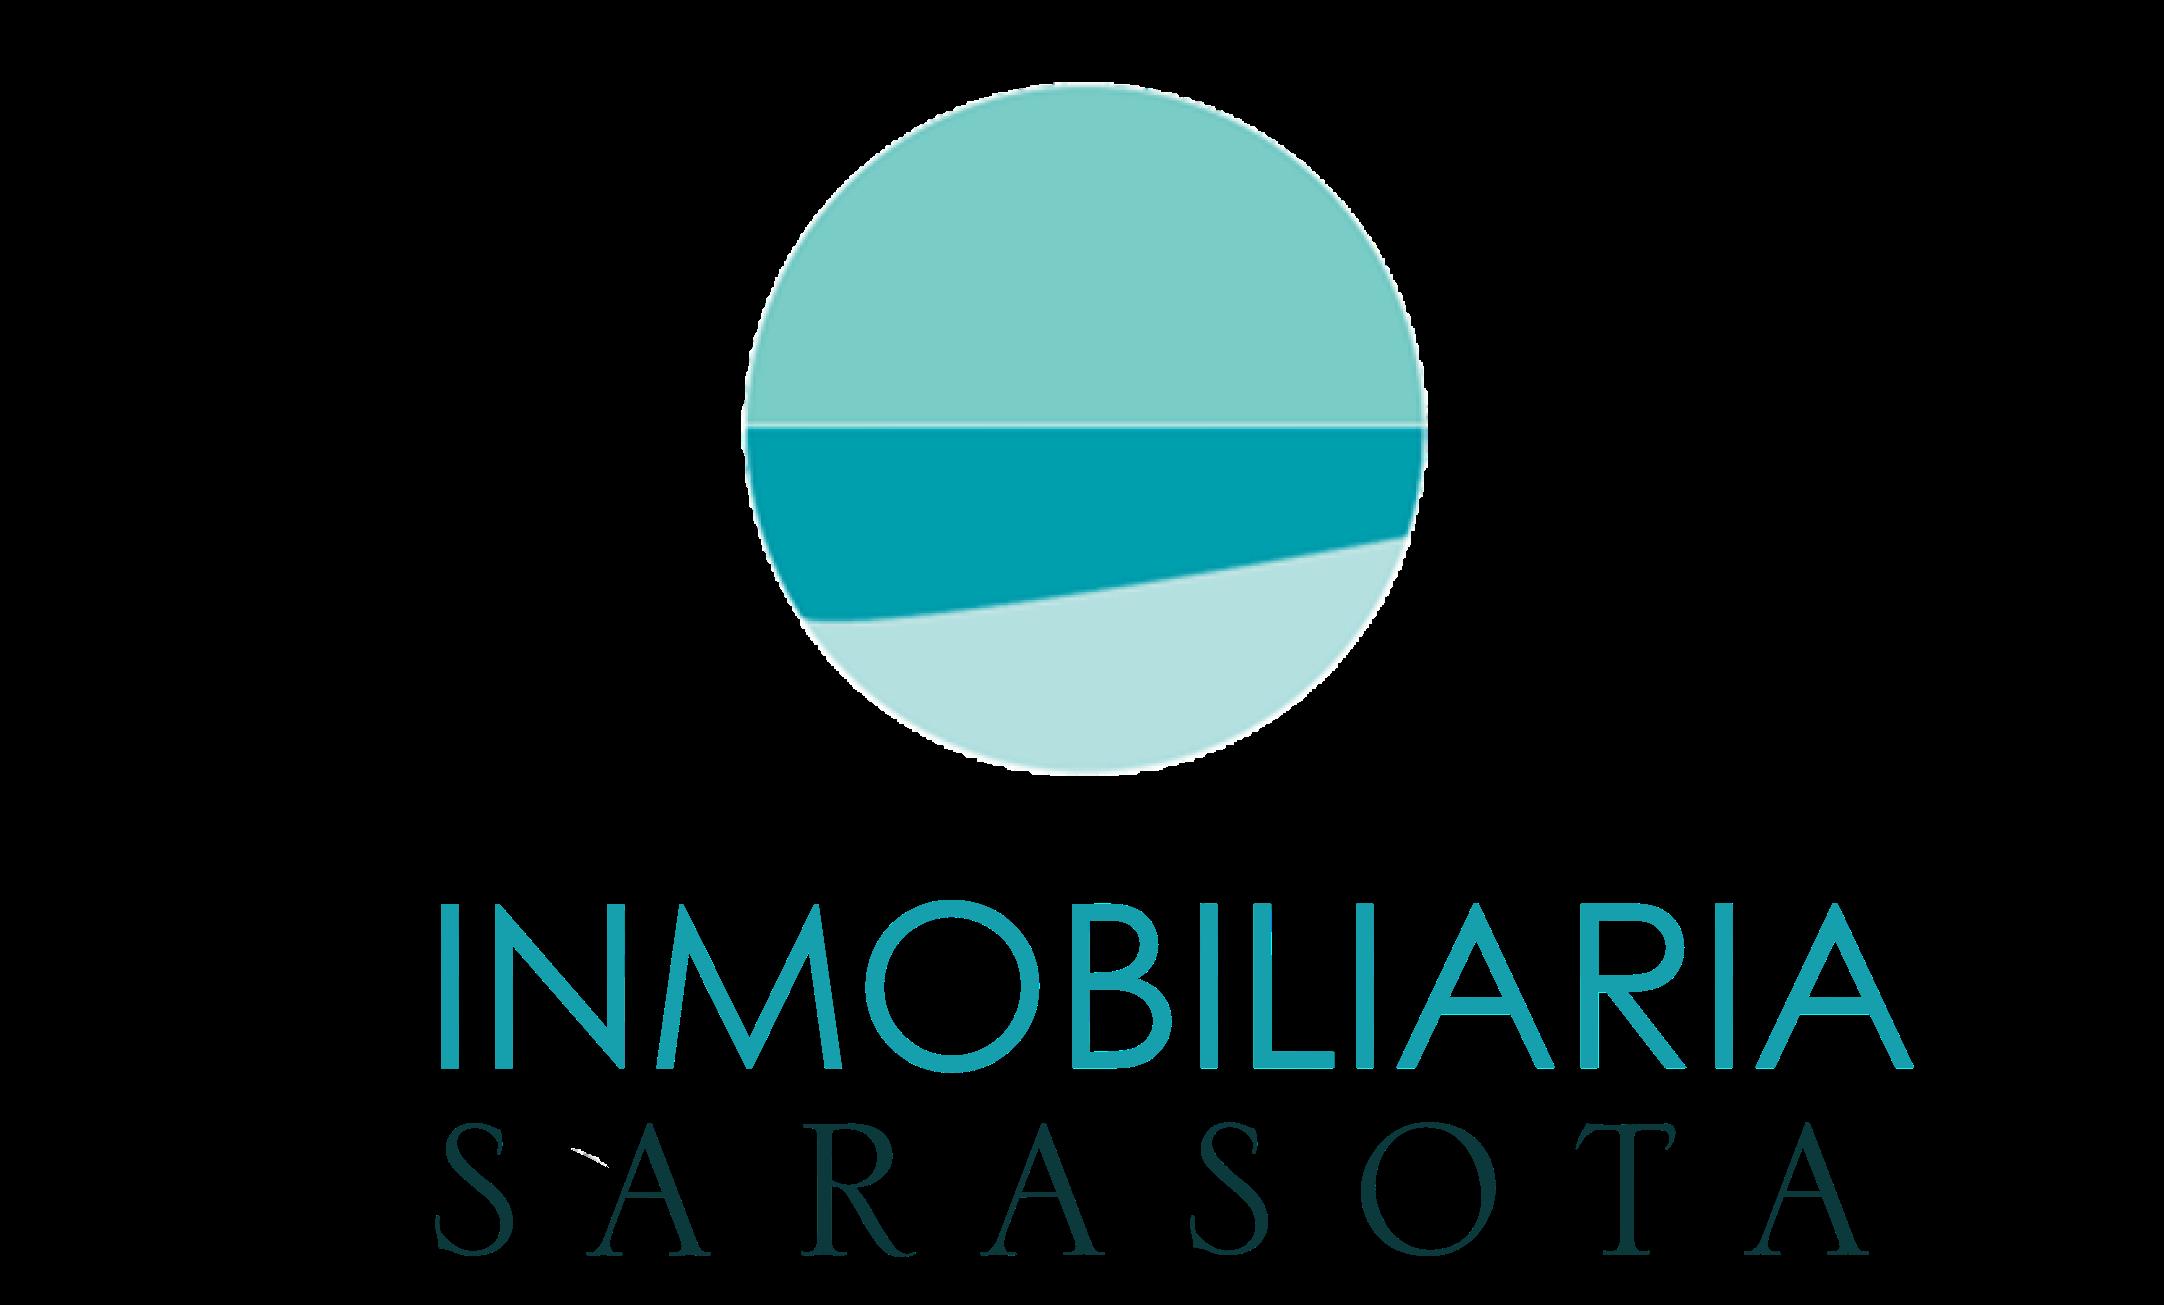 Inmobiliaria Sarasota